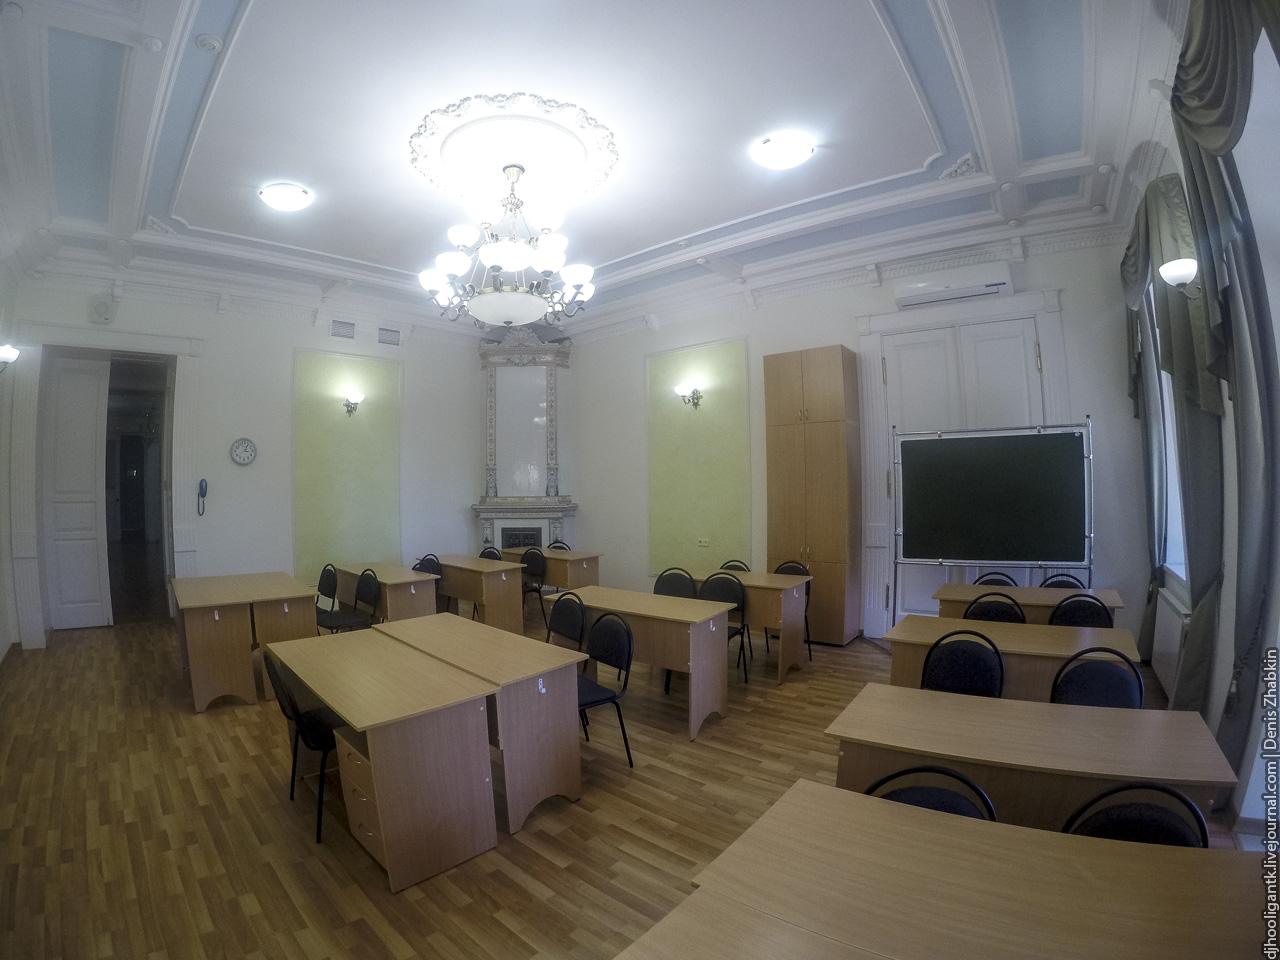 GOPR3489_1.jpg